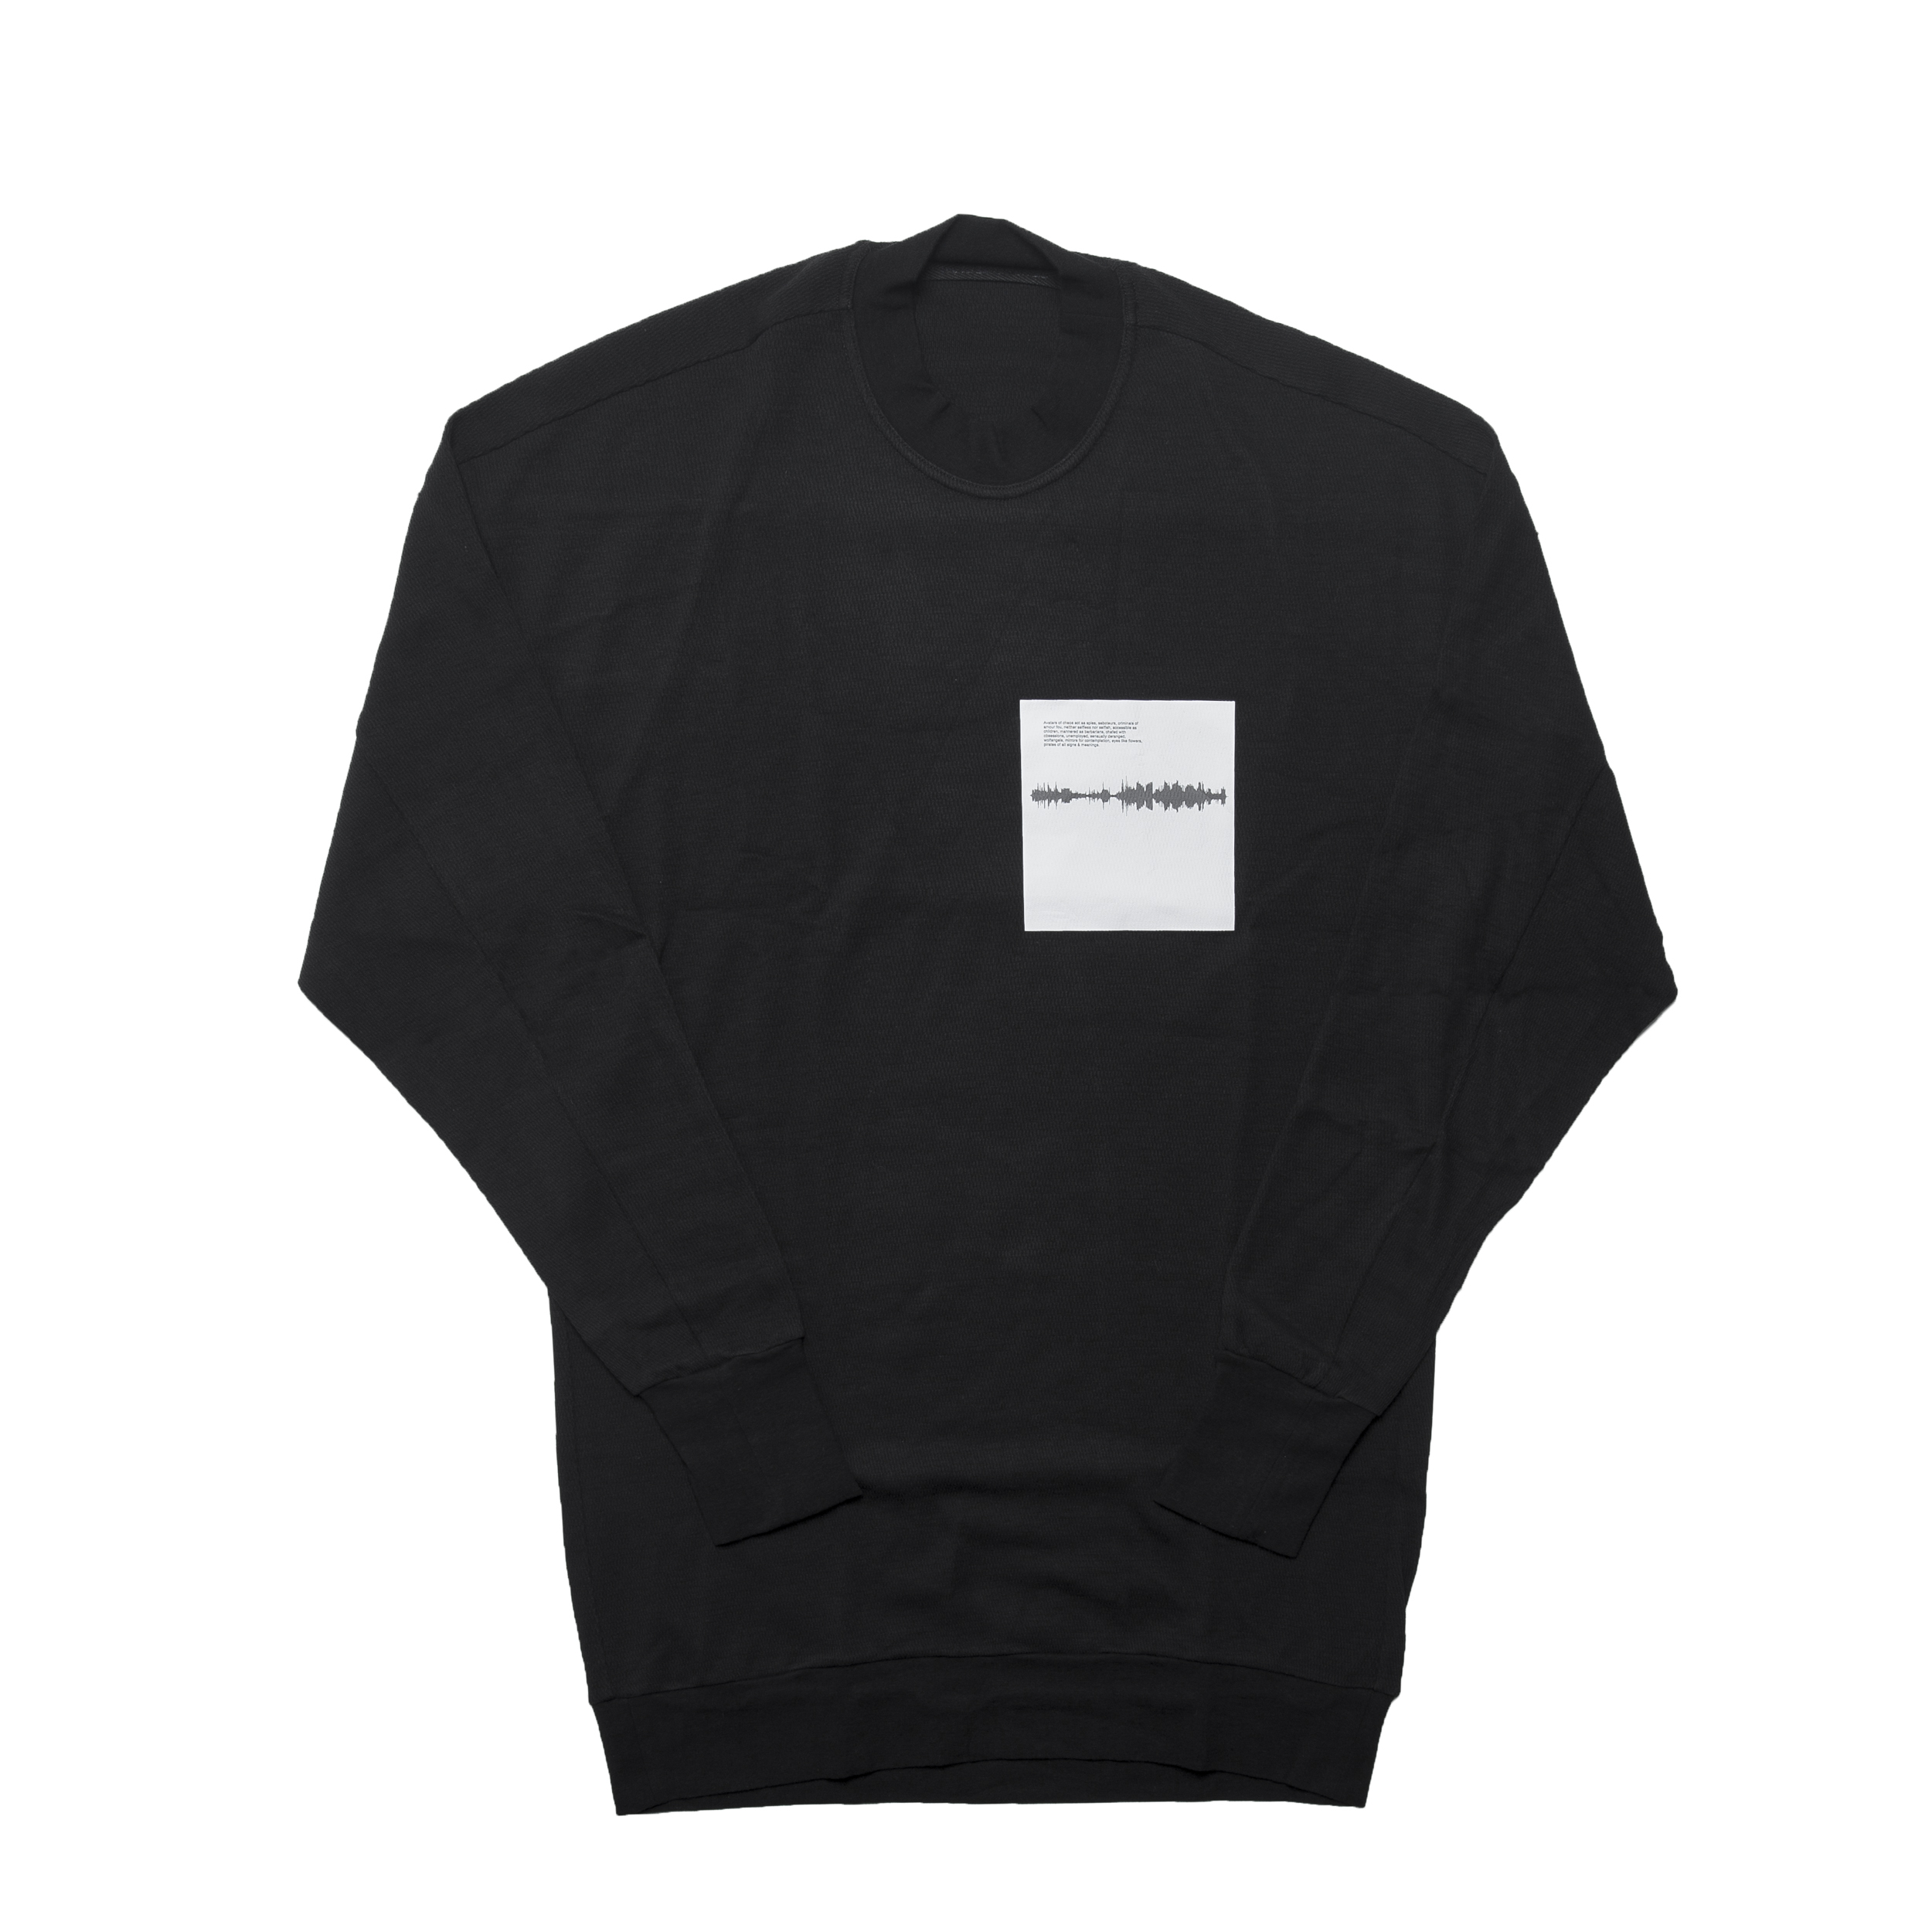 677CPM16-BLACK / Shaped Noise ロングスリーヴ Tシャツ